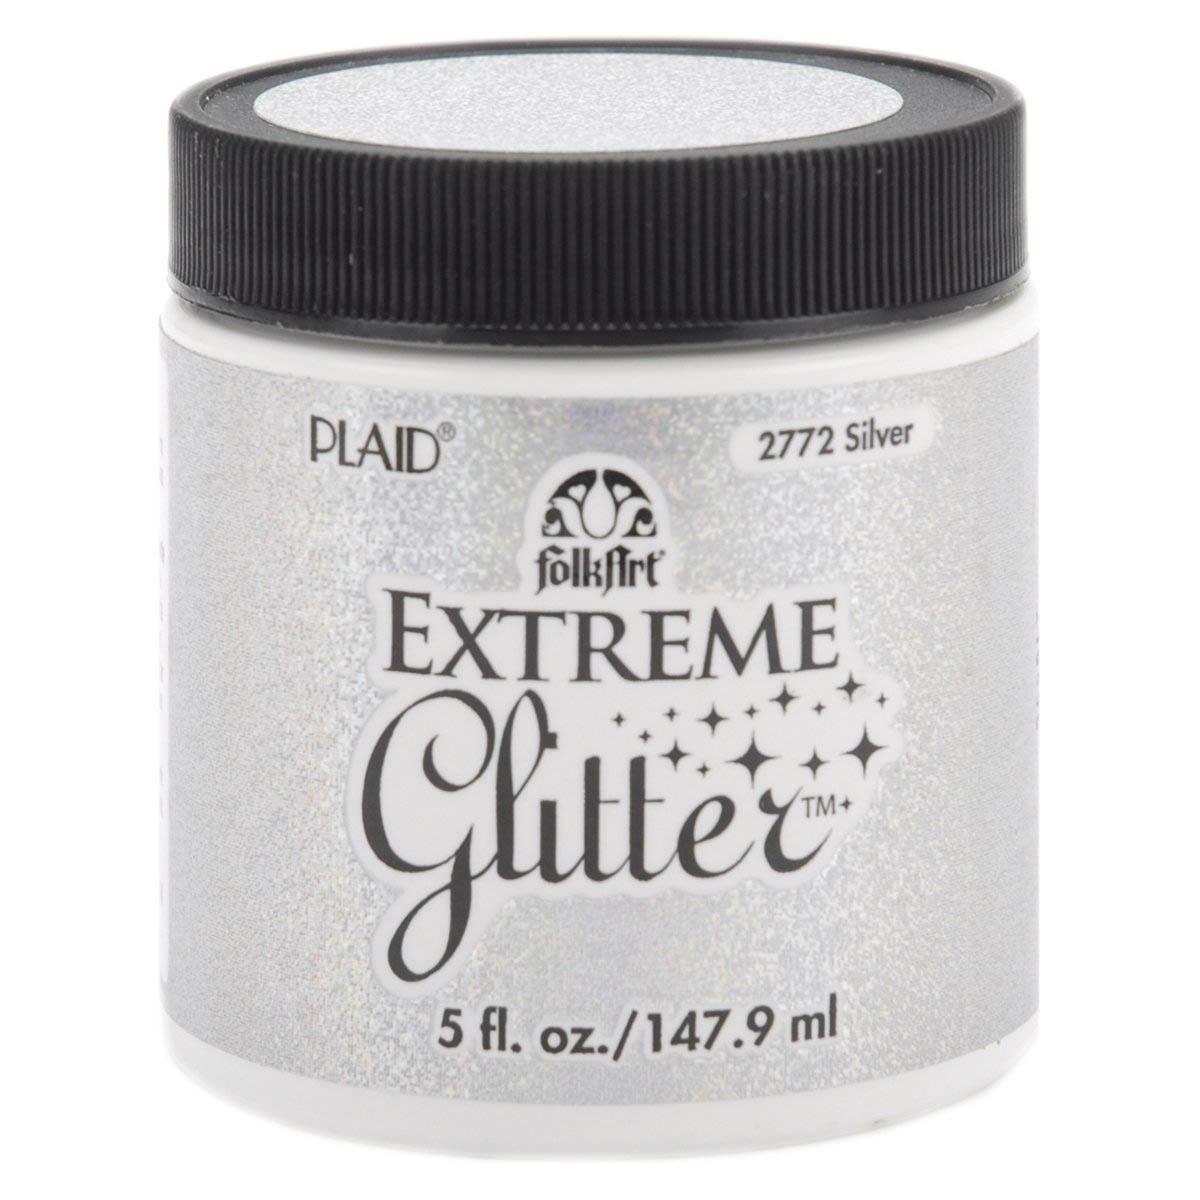 FolkArt ® Extreme Glitter™ - Silver, 5 oz.